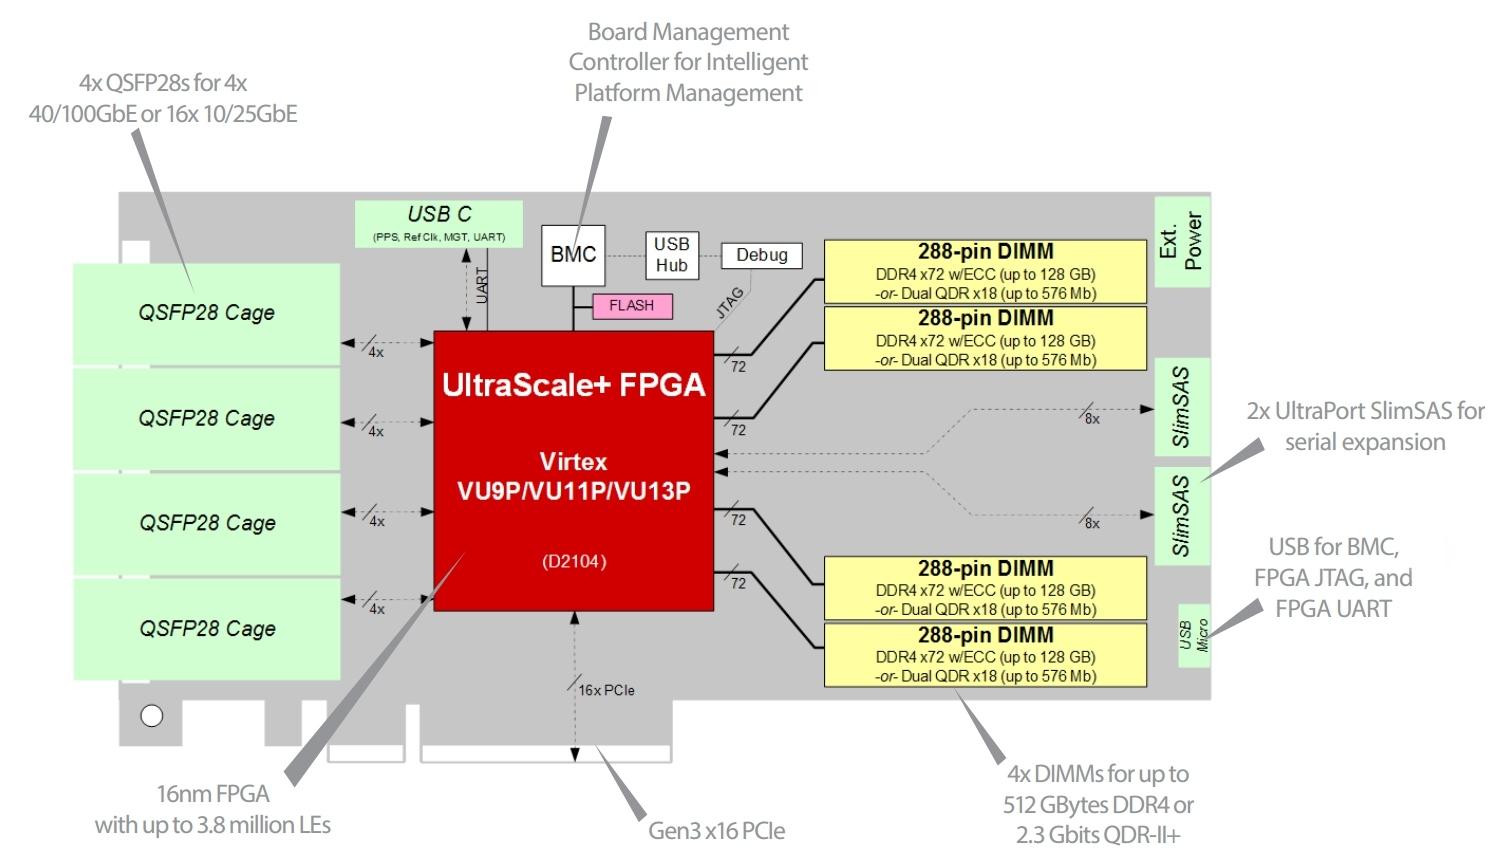 BittWare XUPVV4 UltraScale+ VU13P FPGA with 4x QSFP and 512 GB DDR4